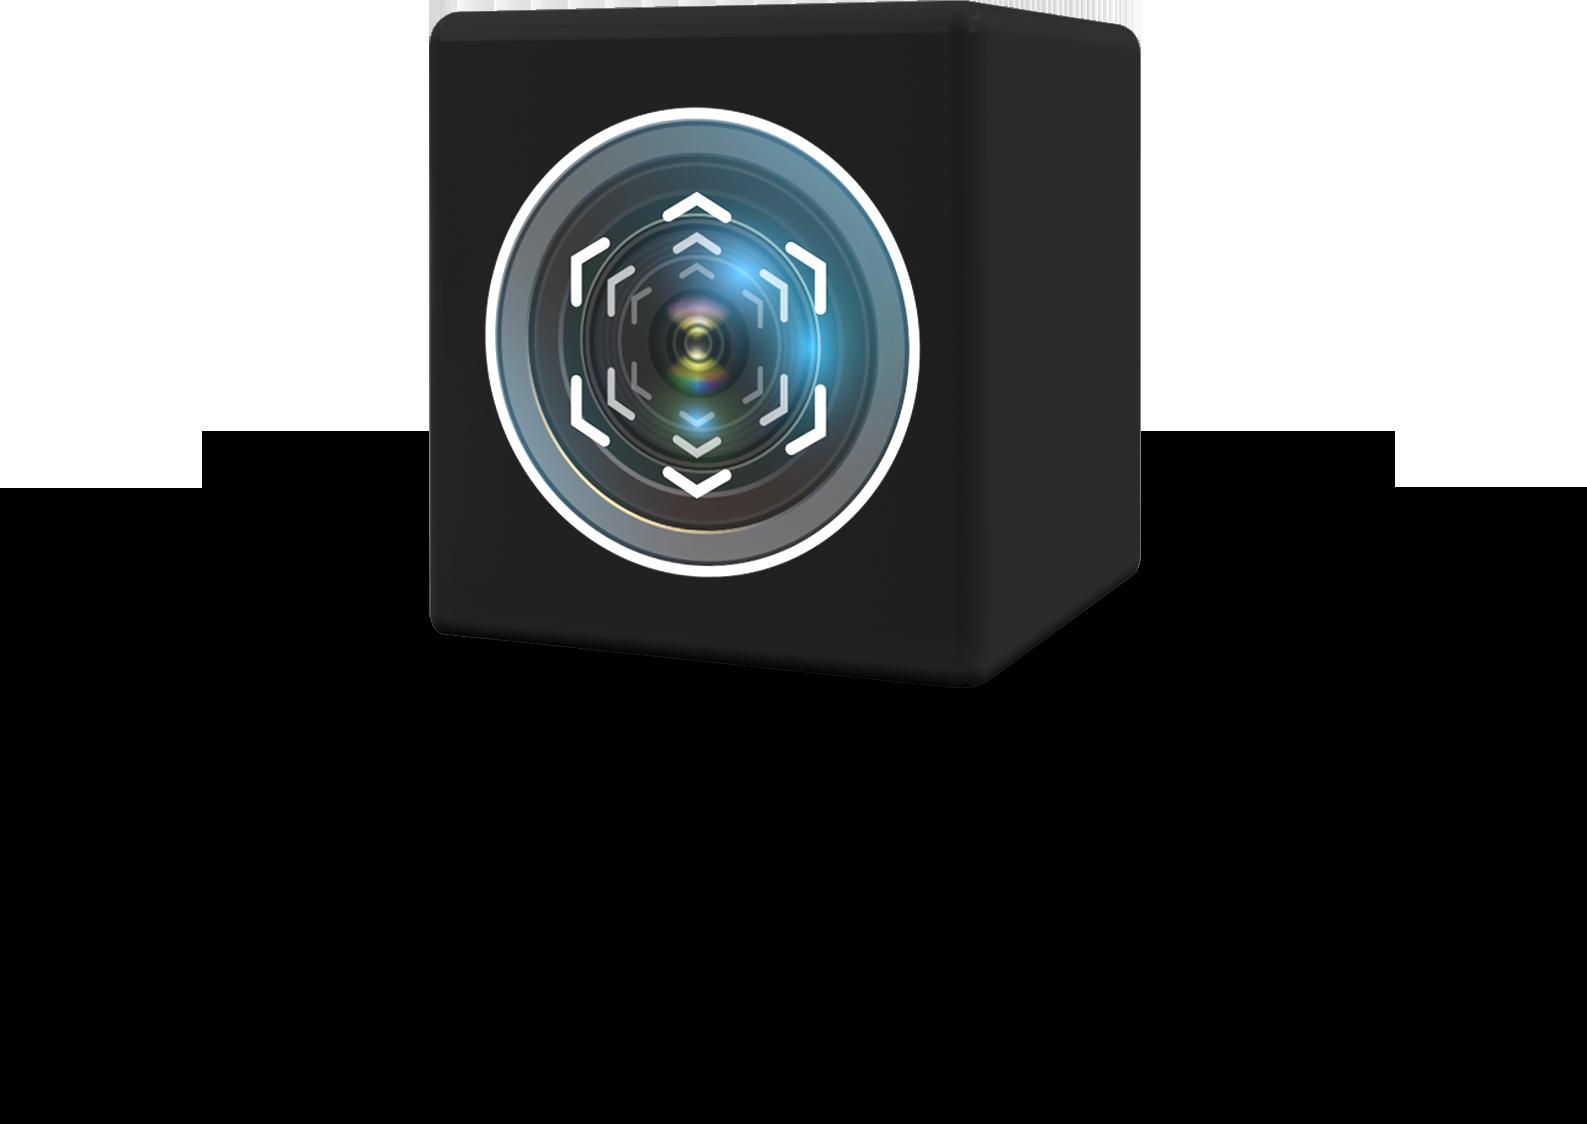 Cube_NexTech_AR_Solutions_ARitize360